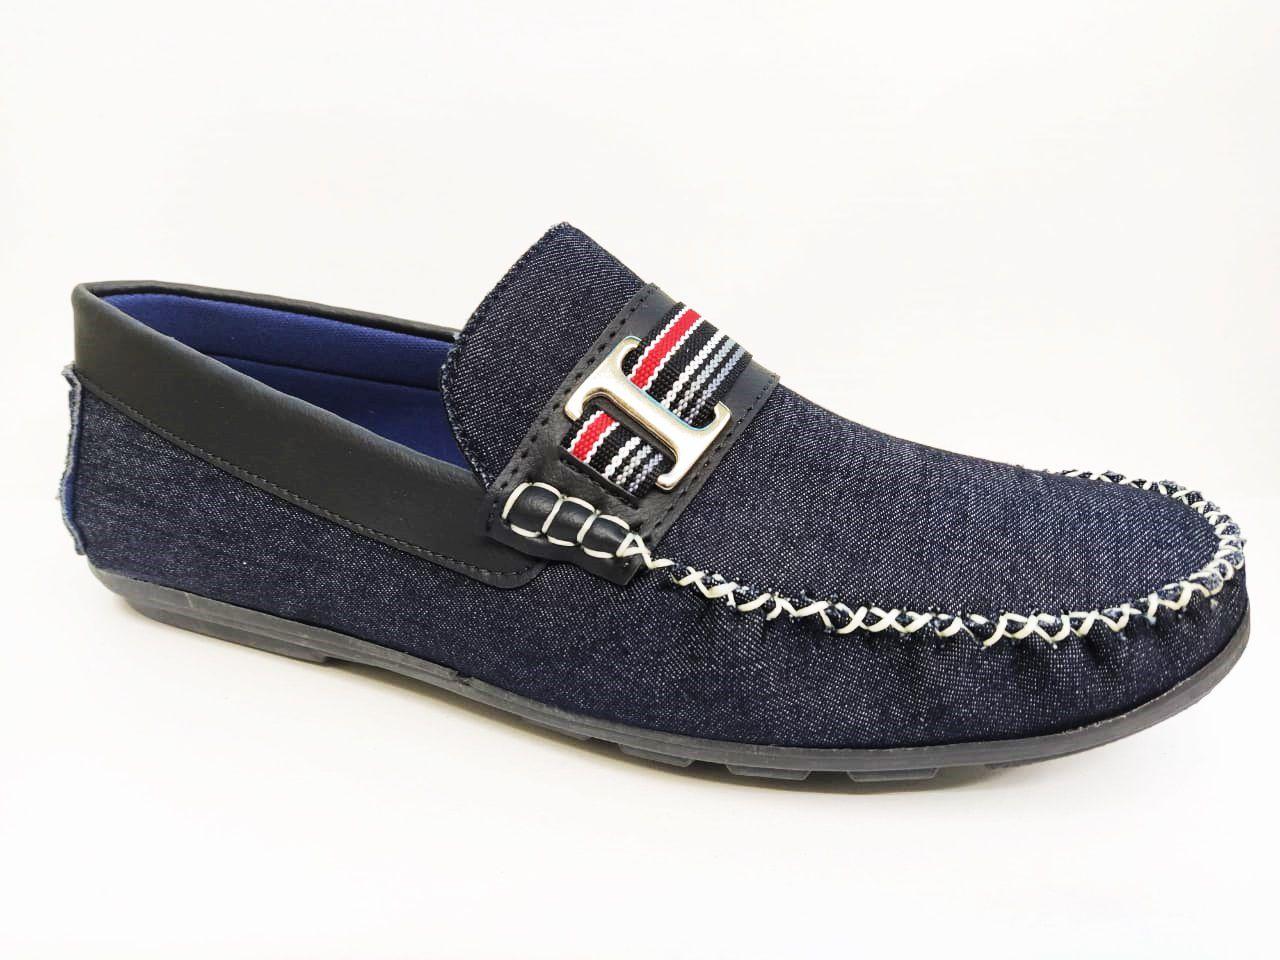 DockSide Masculino MOCFLEX 535 - Jeans / Preto